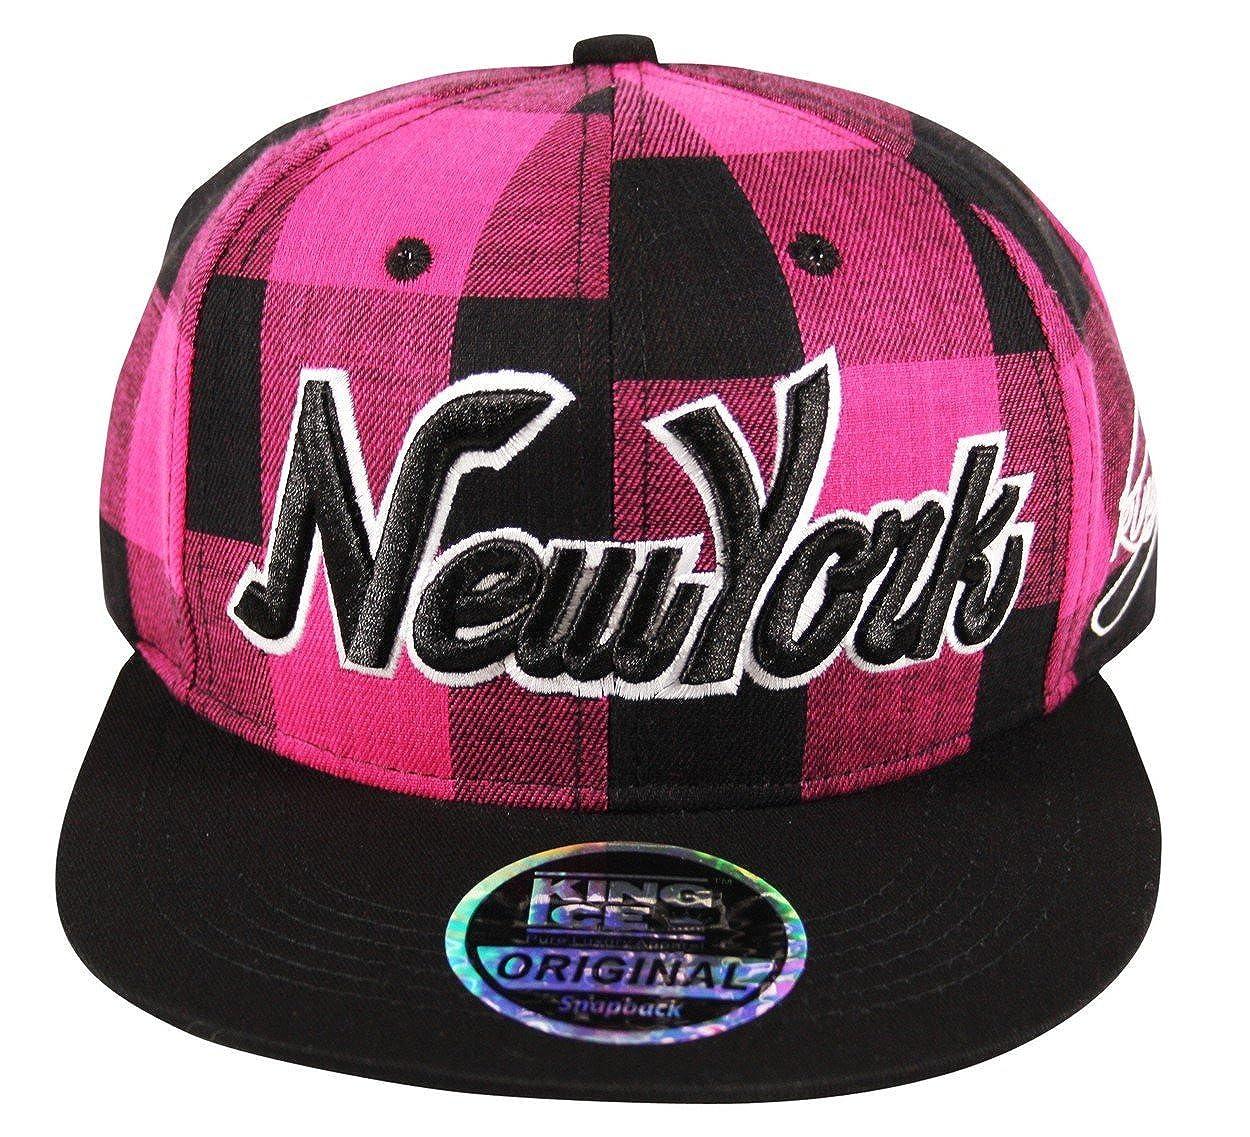 29aa20ba2c259b Itzu Snapback Baseball Cap New York NY Lumberjack Check Hat Adult in  Fuchsia Pink and Black: Amazon.co.uk: Clothing